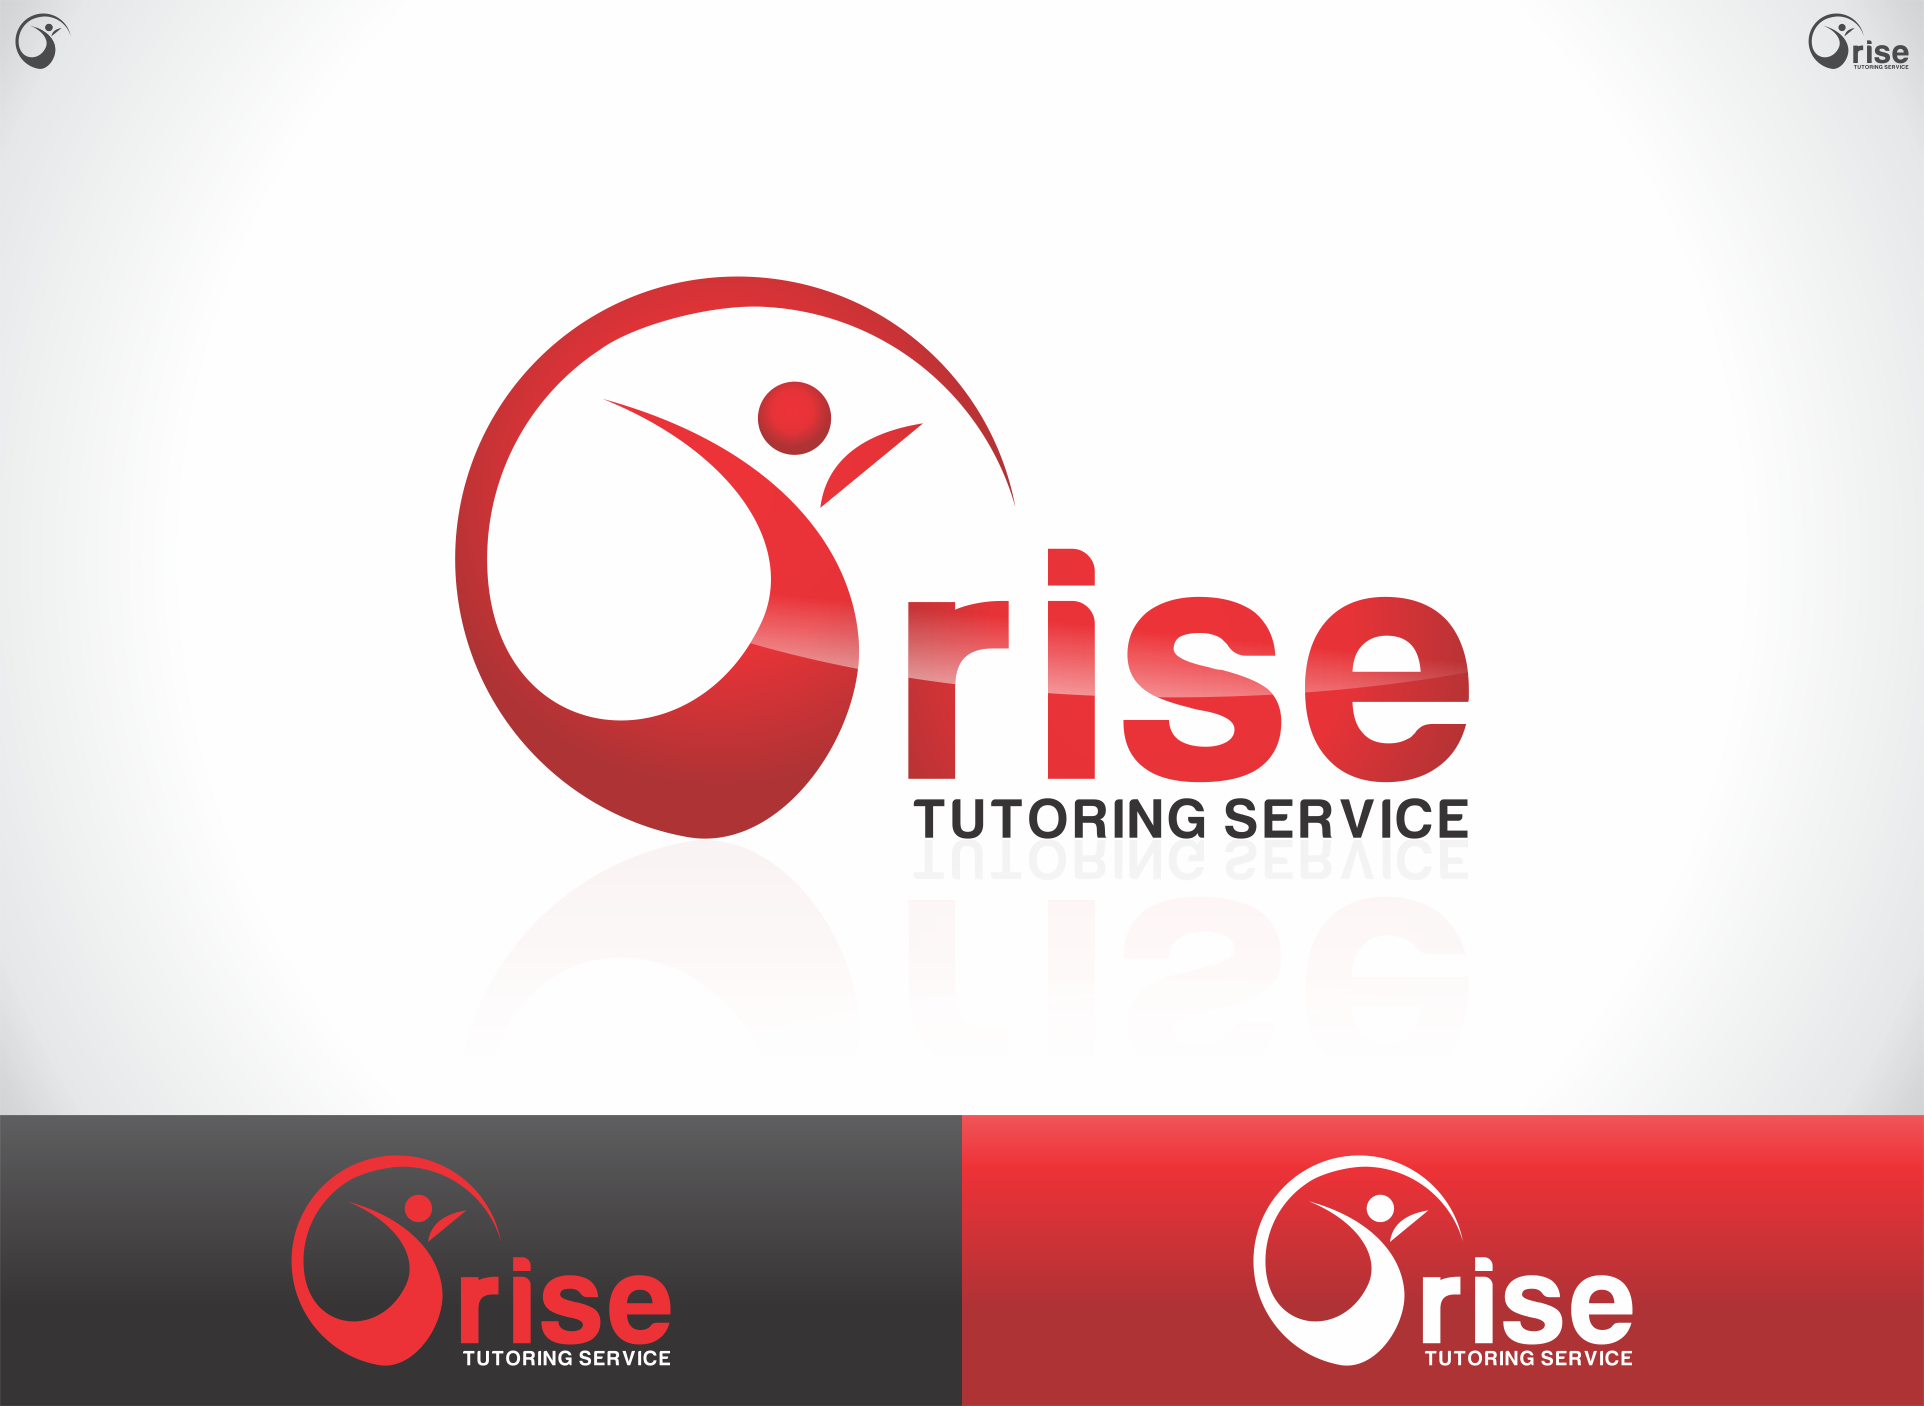 Logo Design by dandor - Entry No. 57 in the Logo Design Contest Imaginative Logo Design for Rise Tutoring Service.